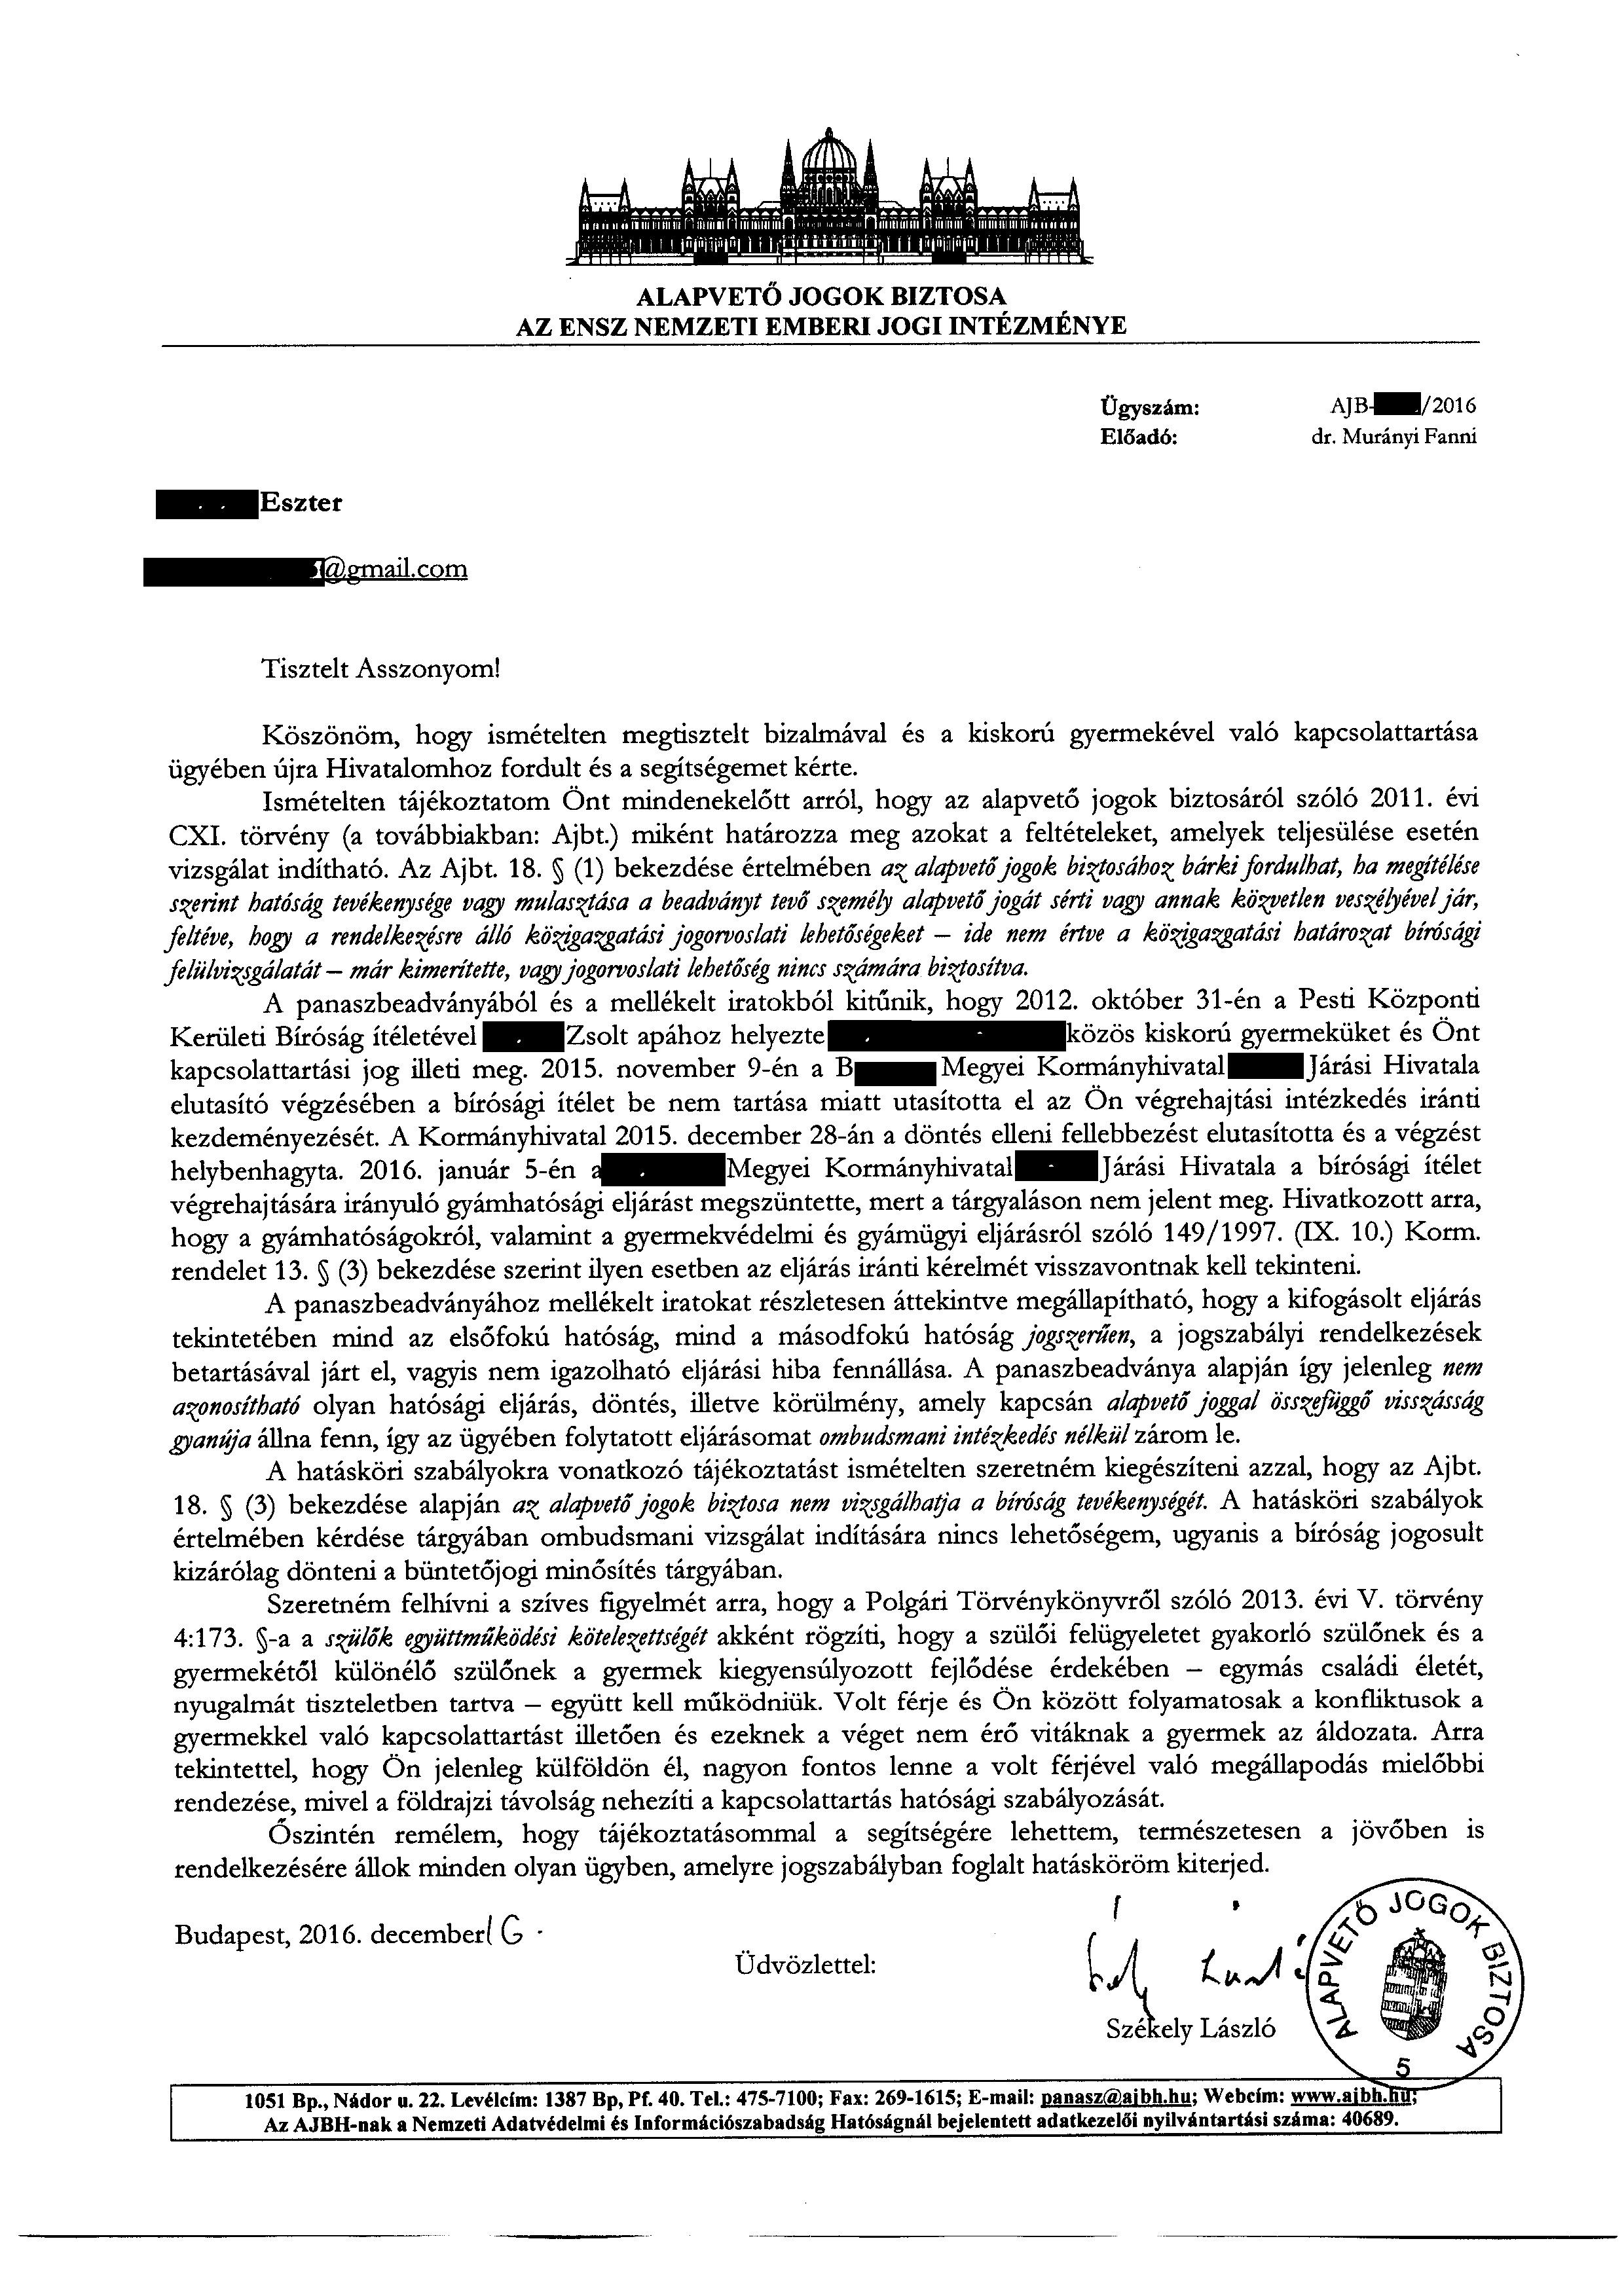 2016-12-16_ombudsman_anonimizalt.jpg